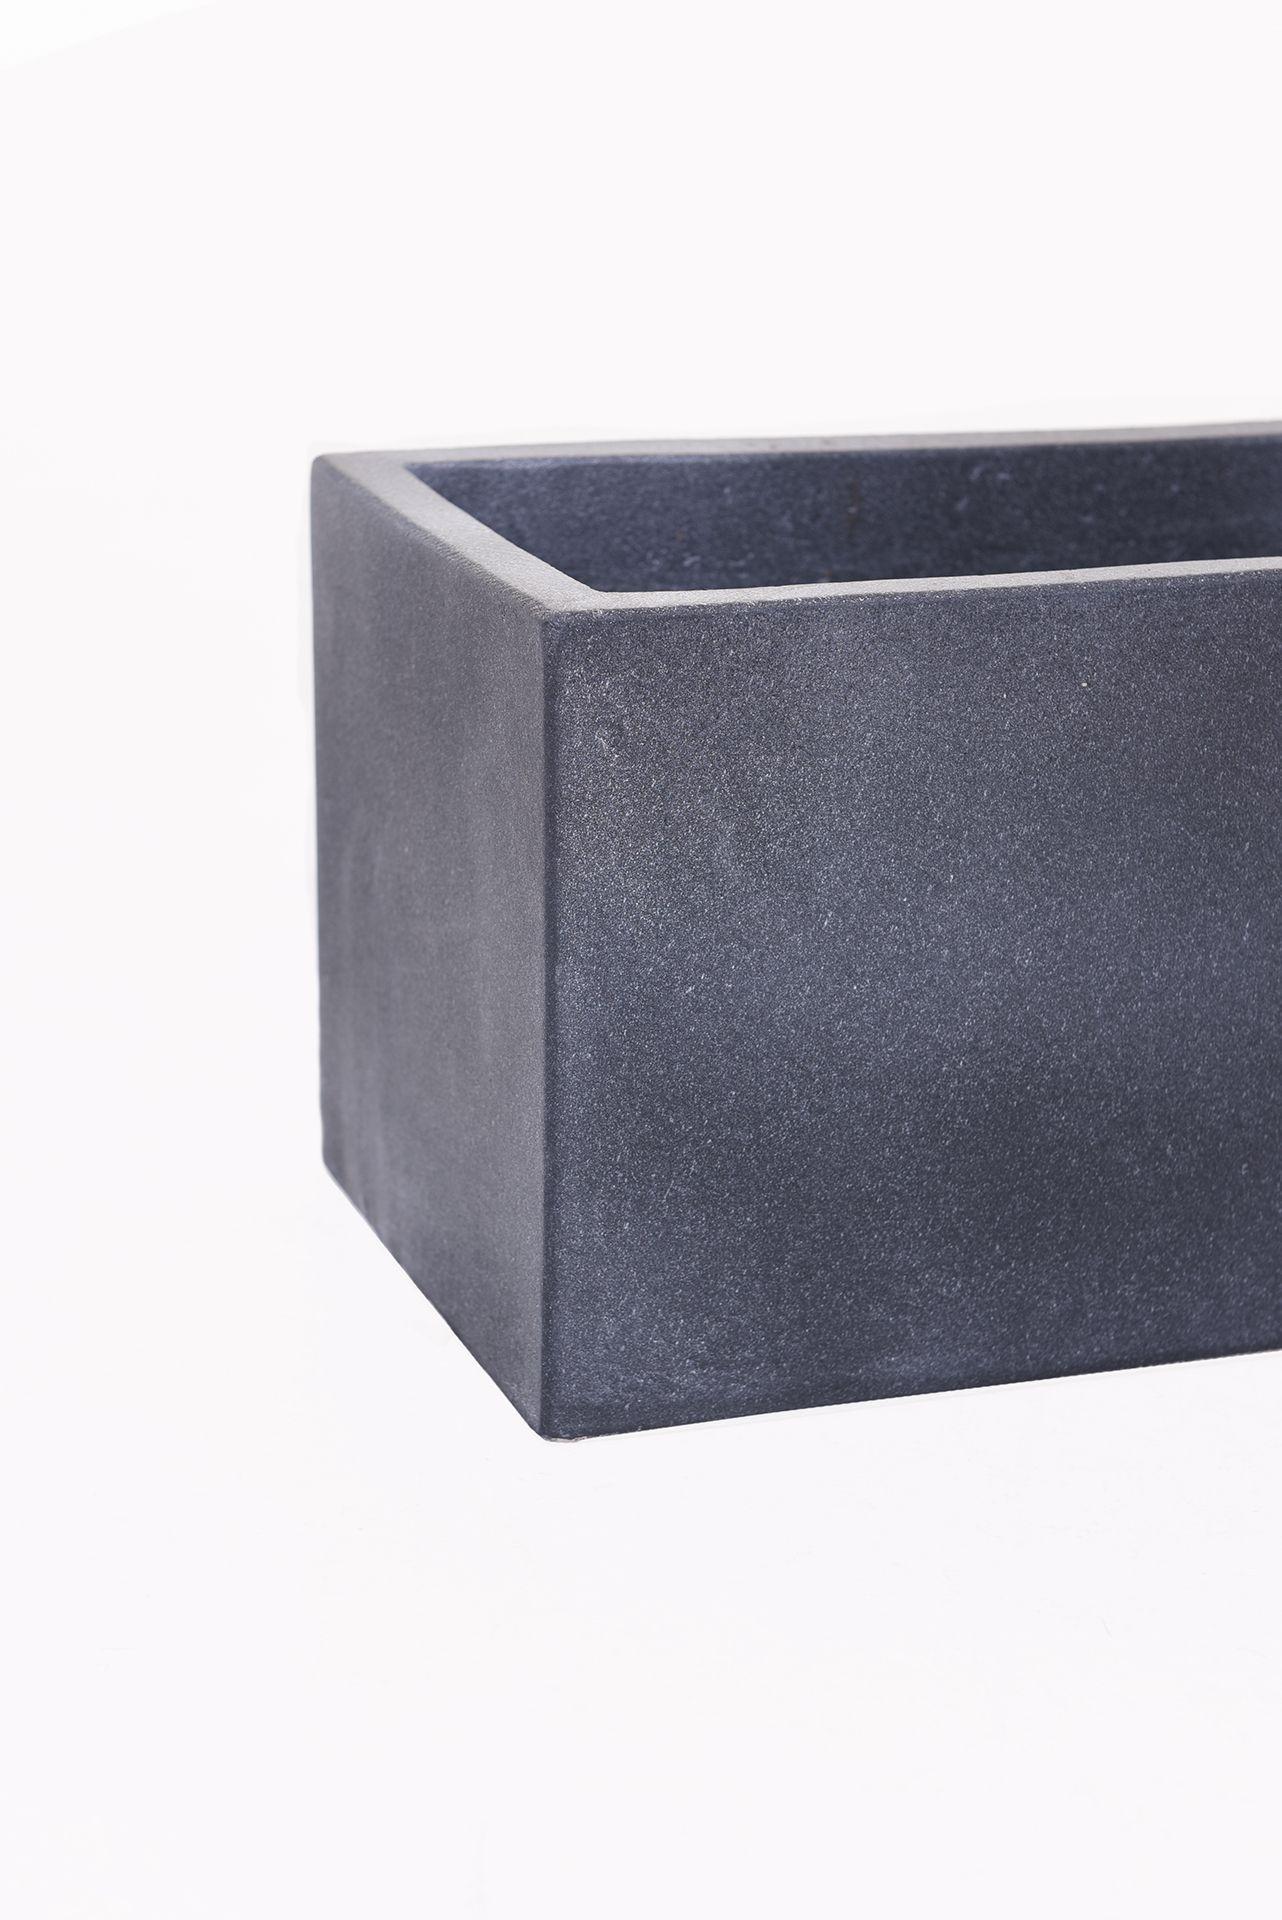 blumenkasten balkonkasten pflanzkasten aus beton flobo 80 cm anthrazit ebay. Black Bedroom Furniture Sets. Home Design Ideas